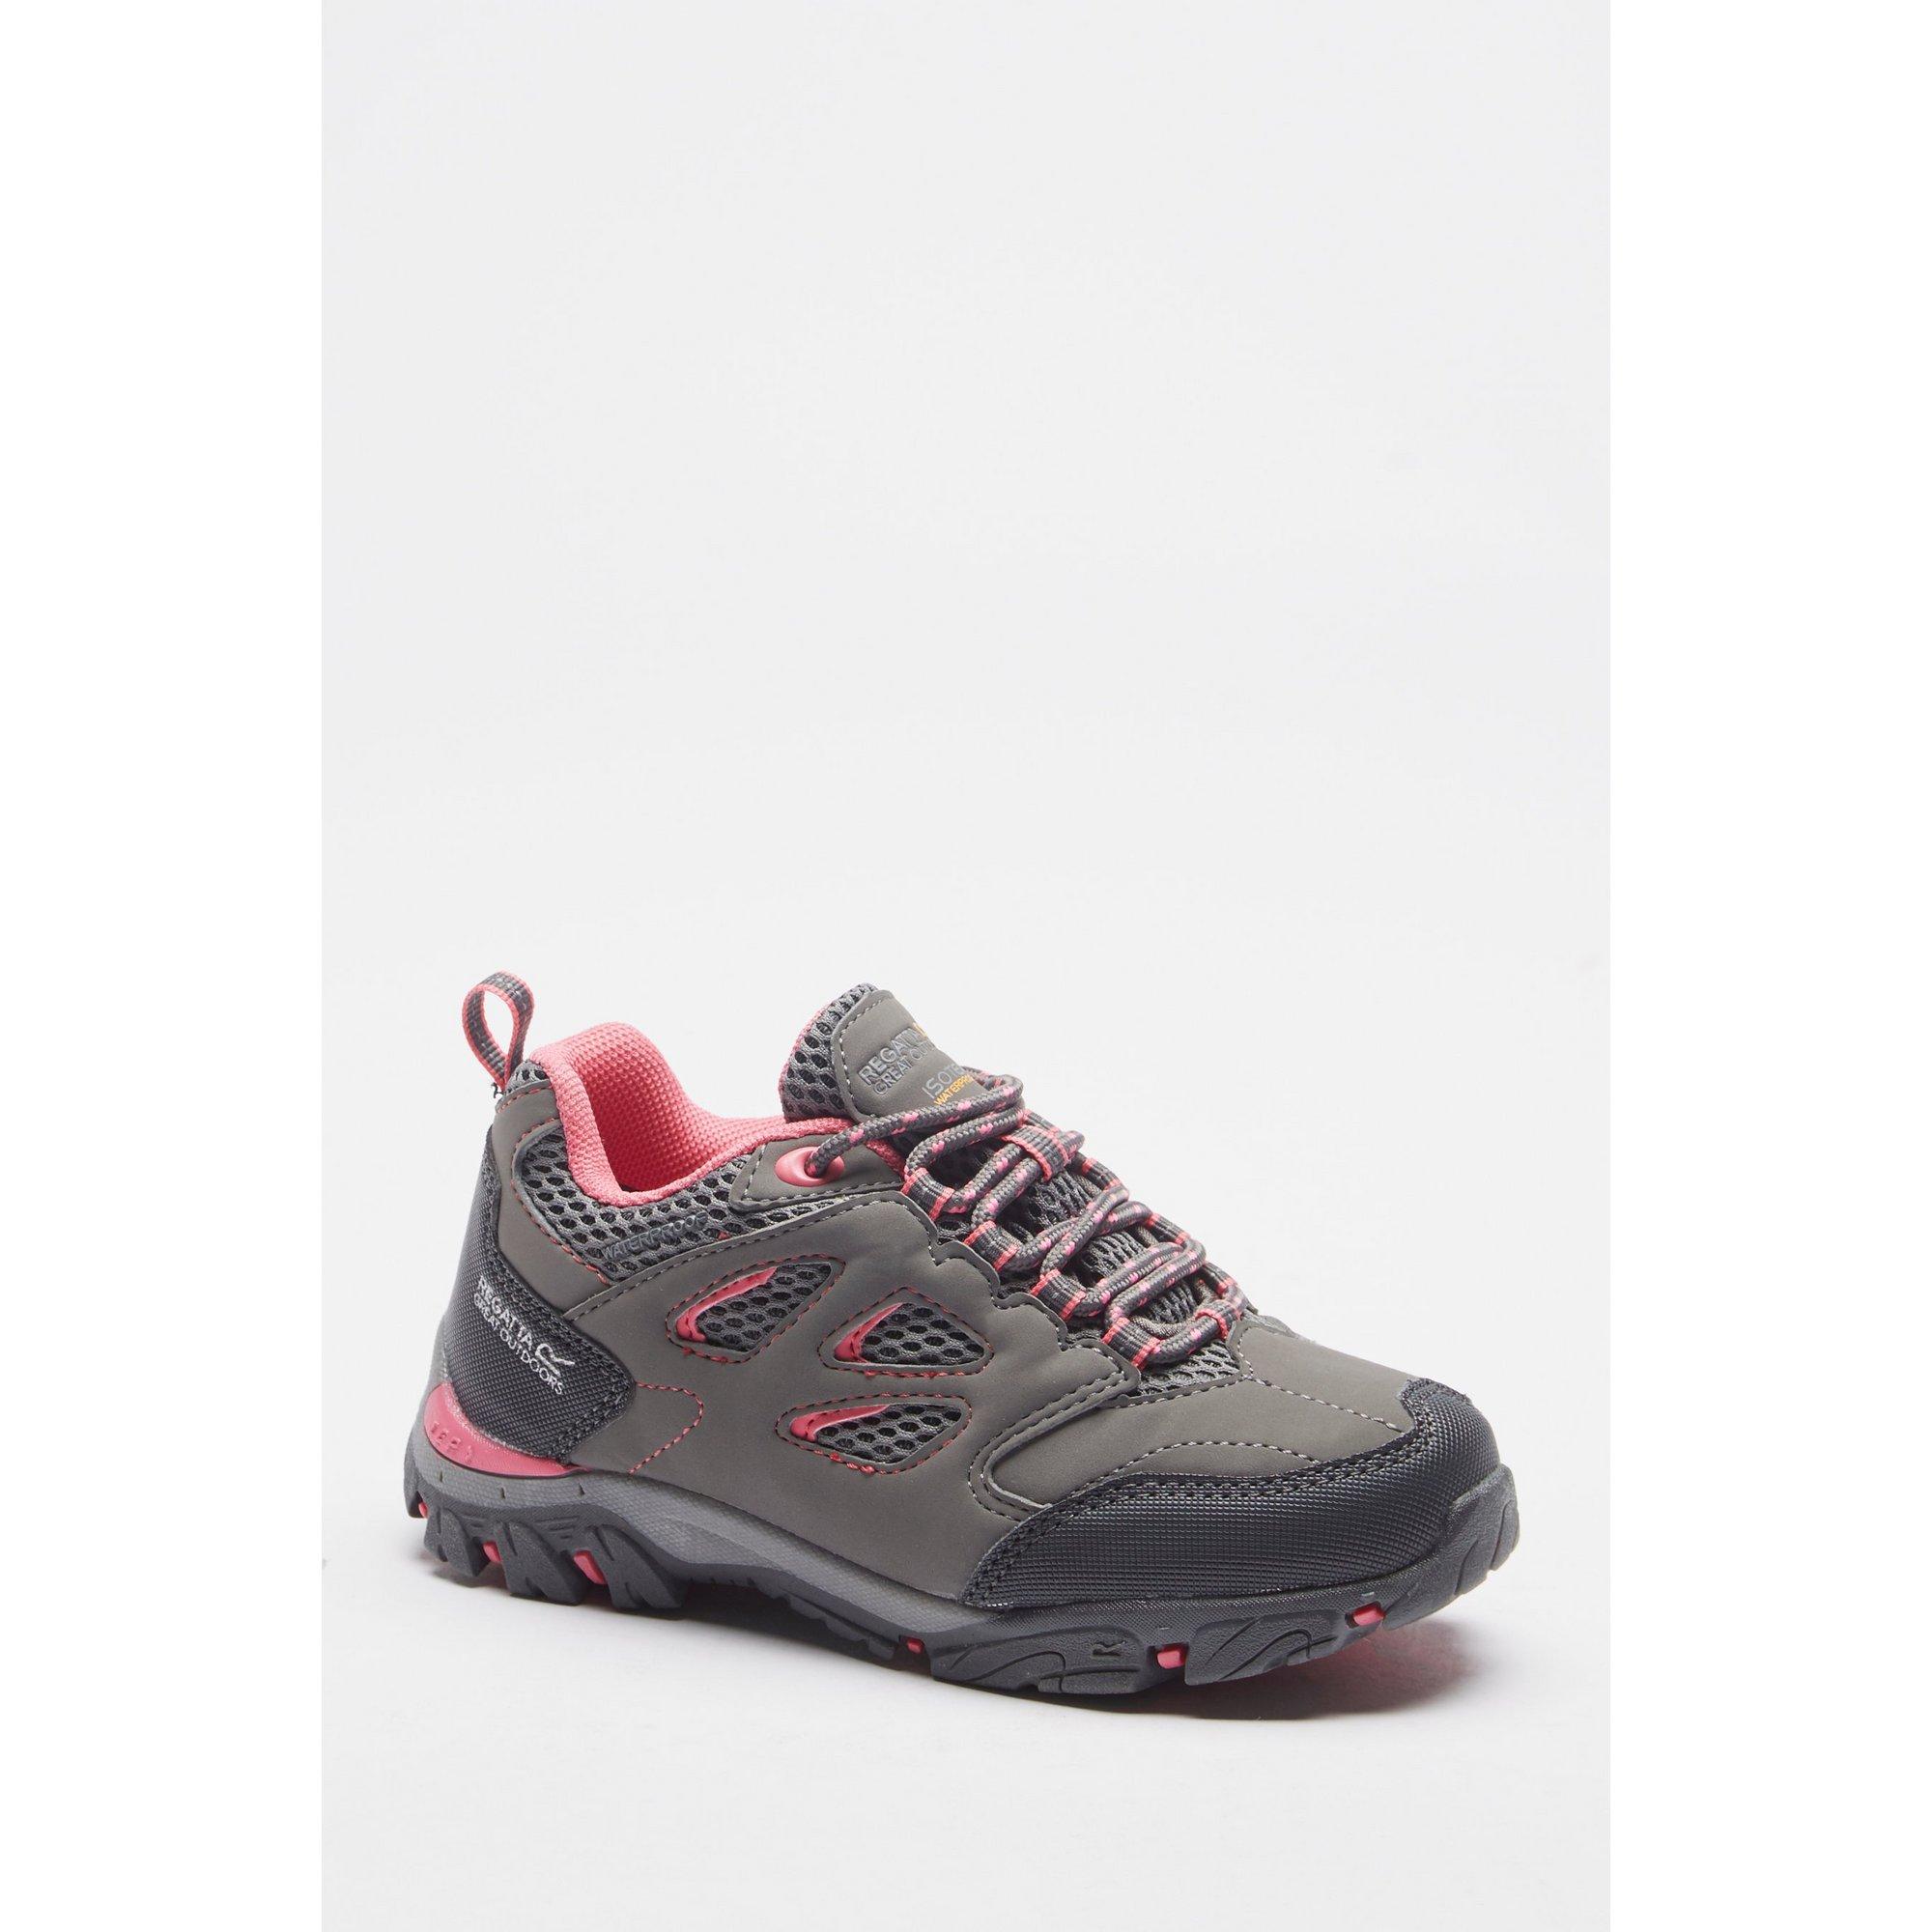 Image of Regatta Holcombe IEP Junior Walking Shoes